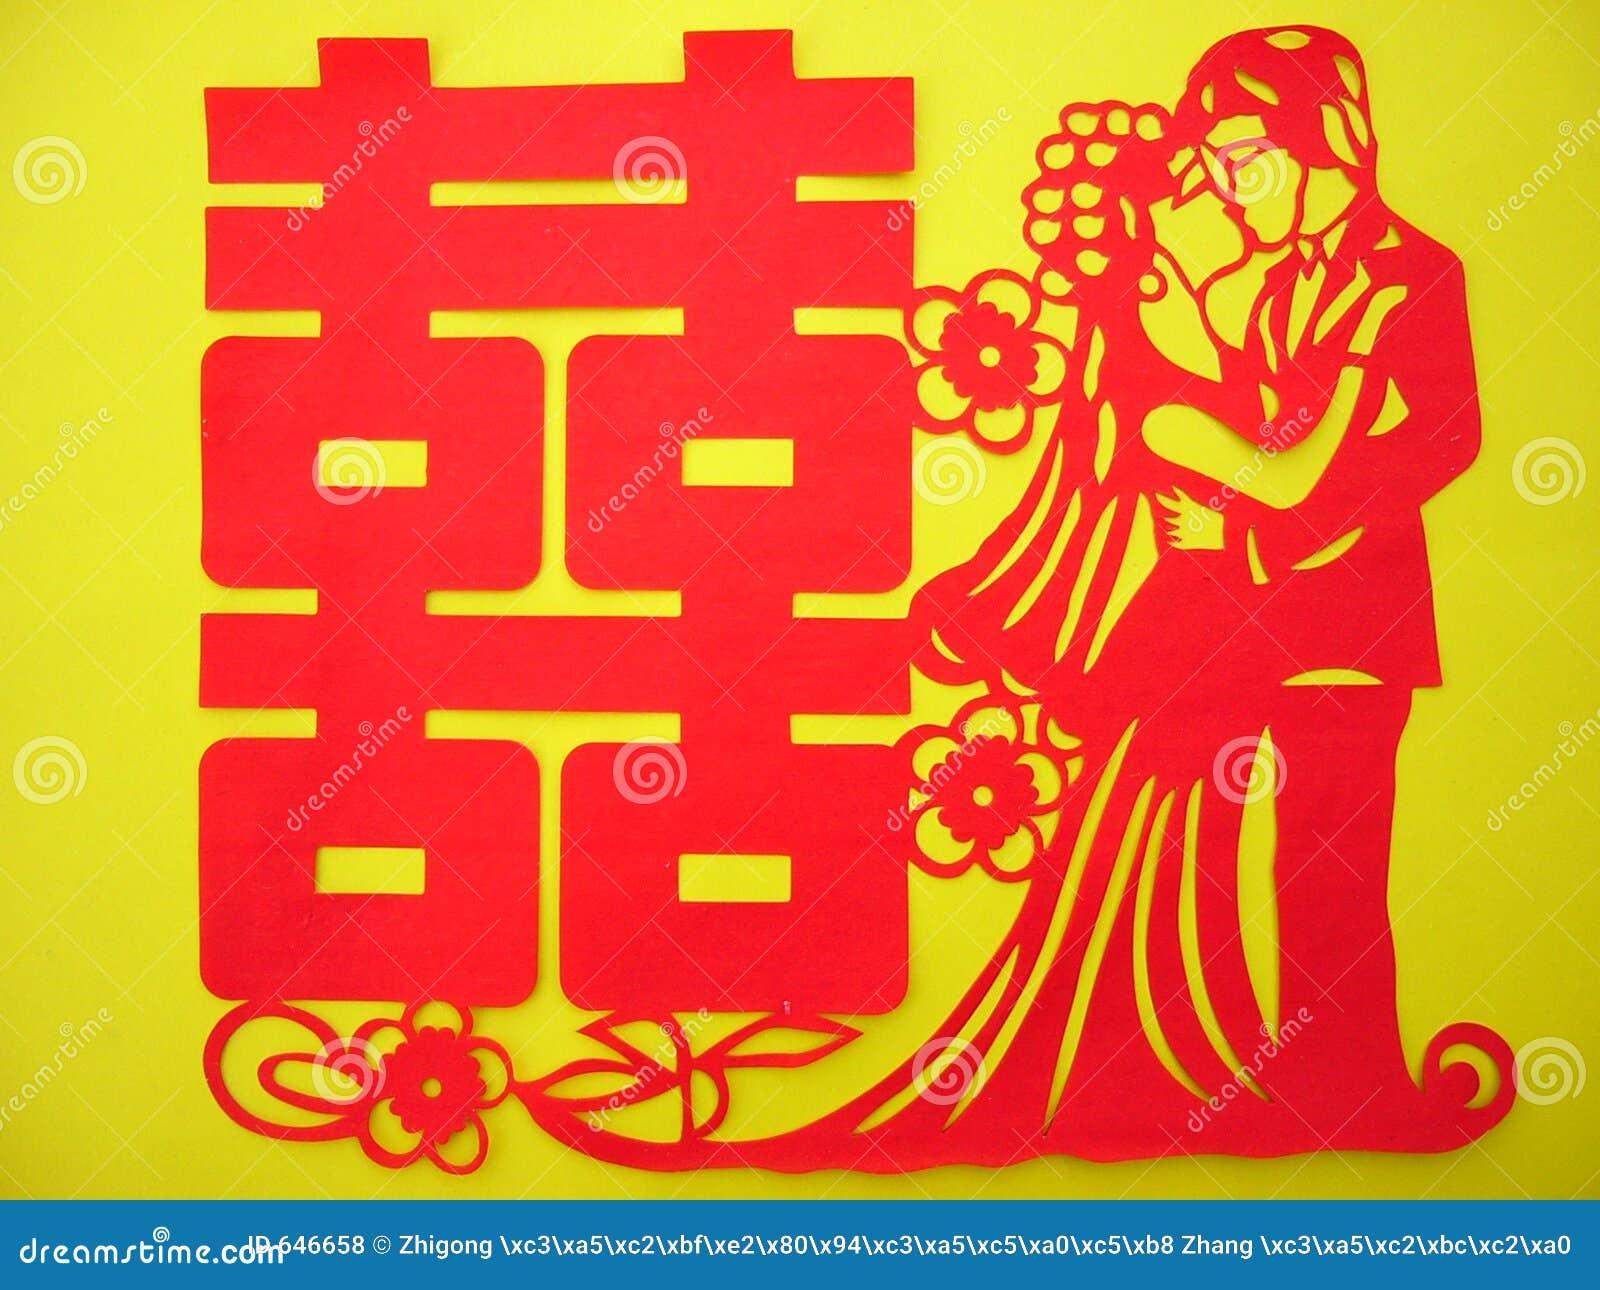 Papercutting chino: Felicidad doble roja (vetical)